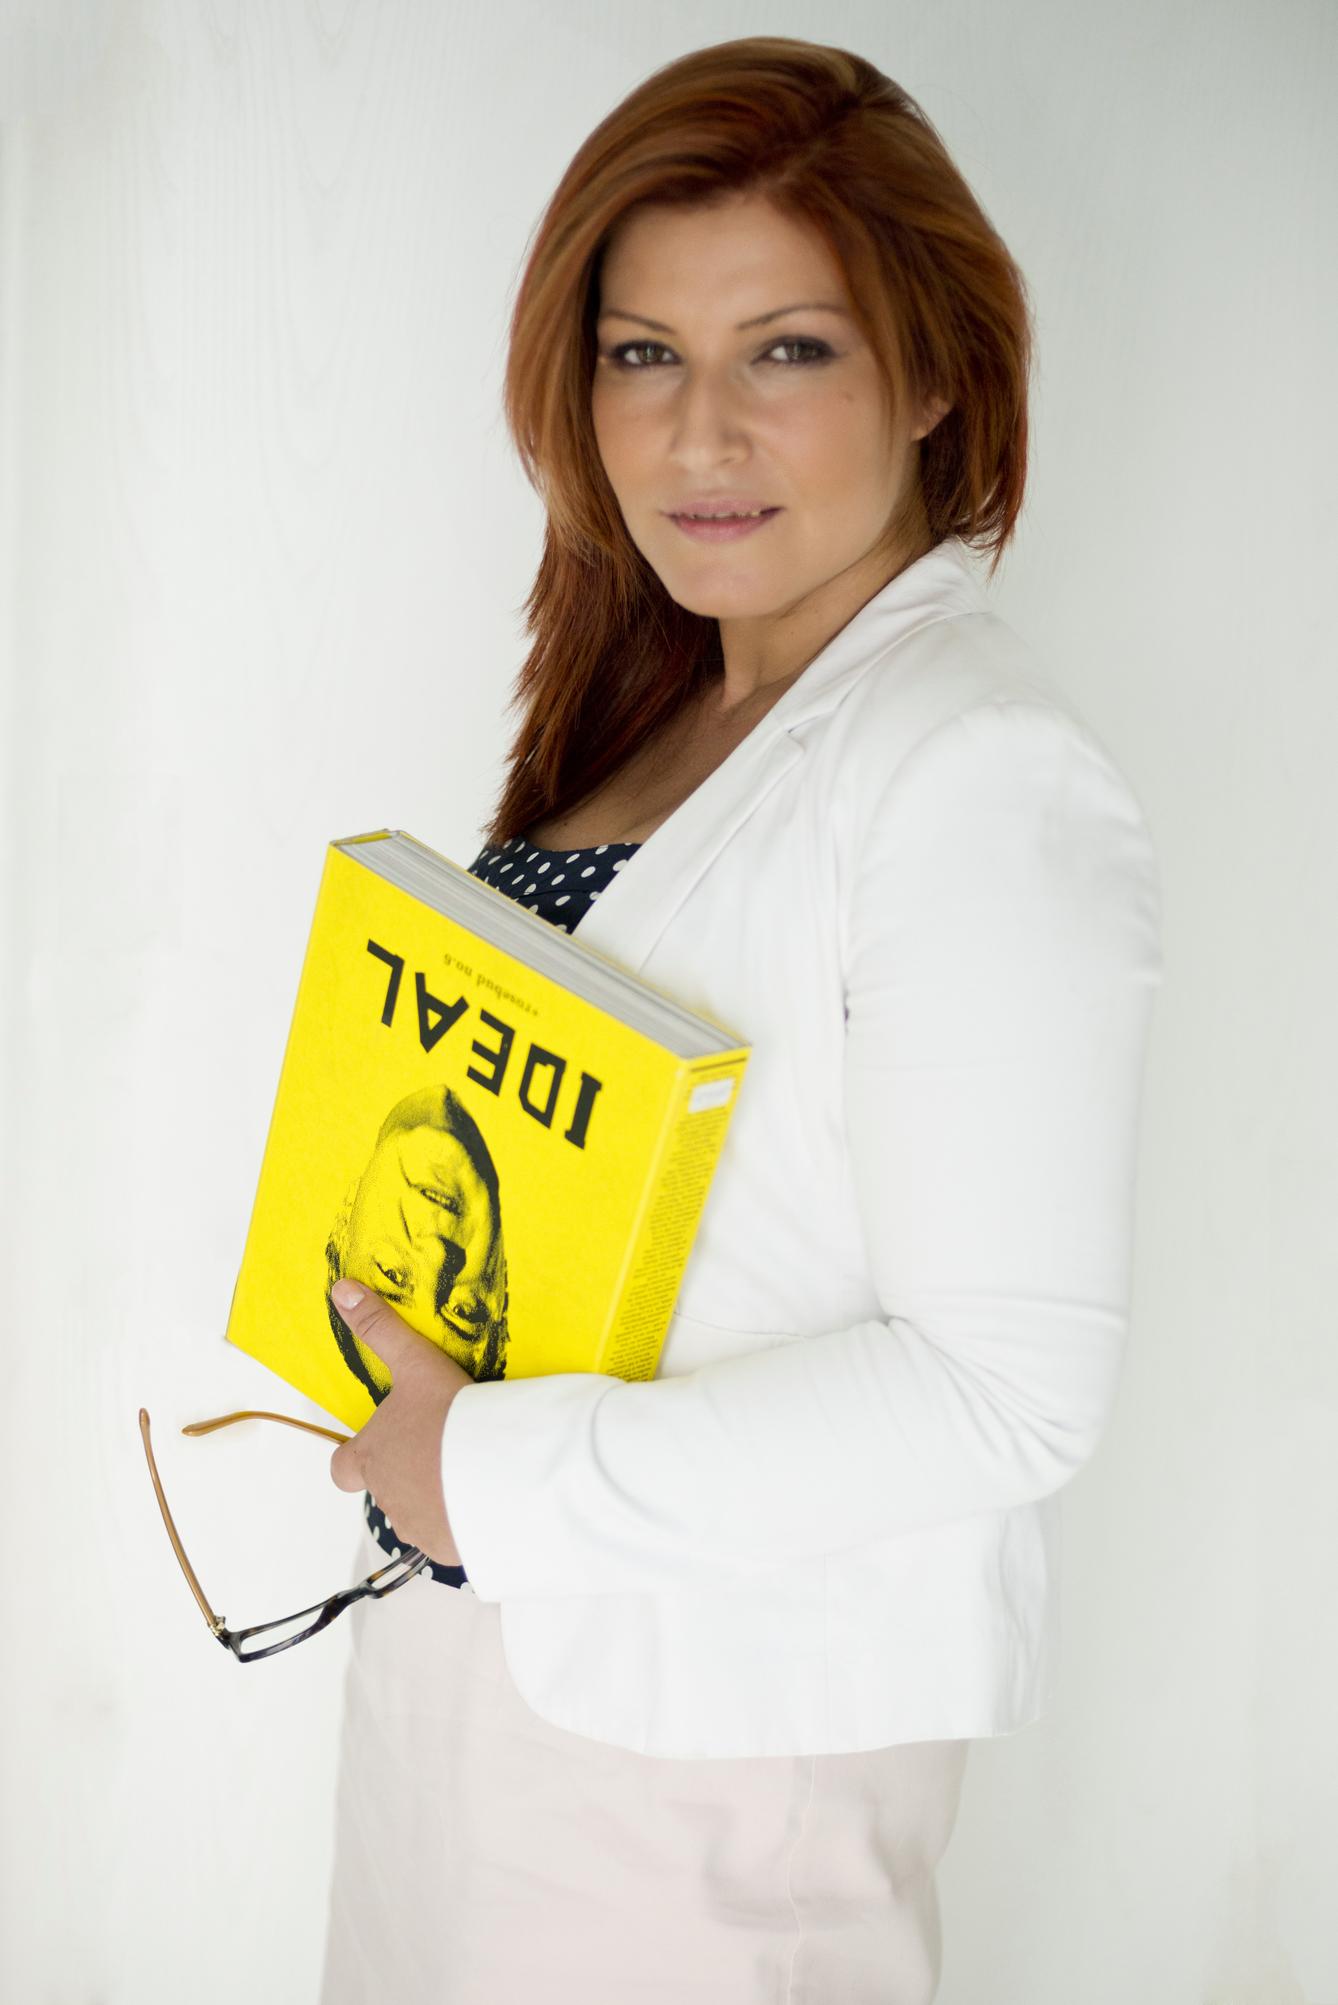 Teodora Migdalovici este ambasador al festivalurilor Lions in Romania si delegat la Dubai Lynx